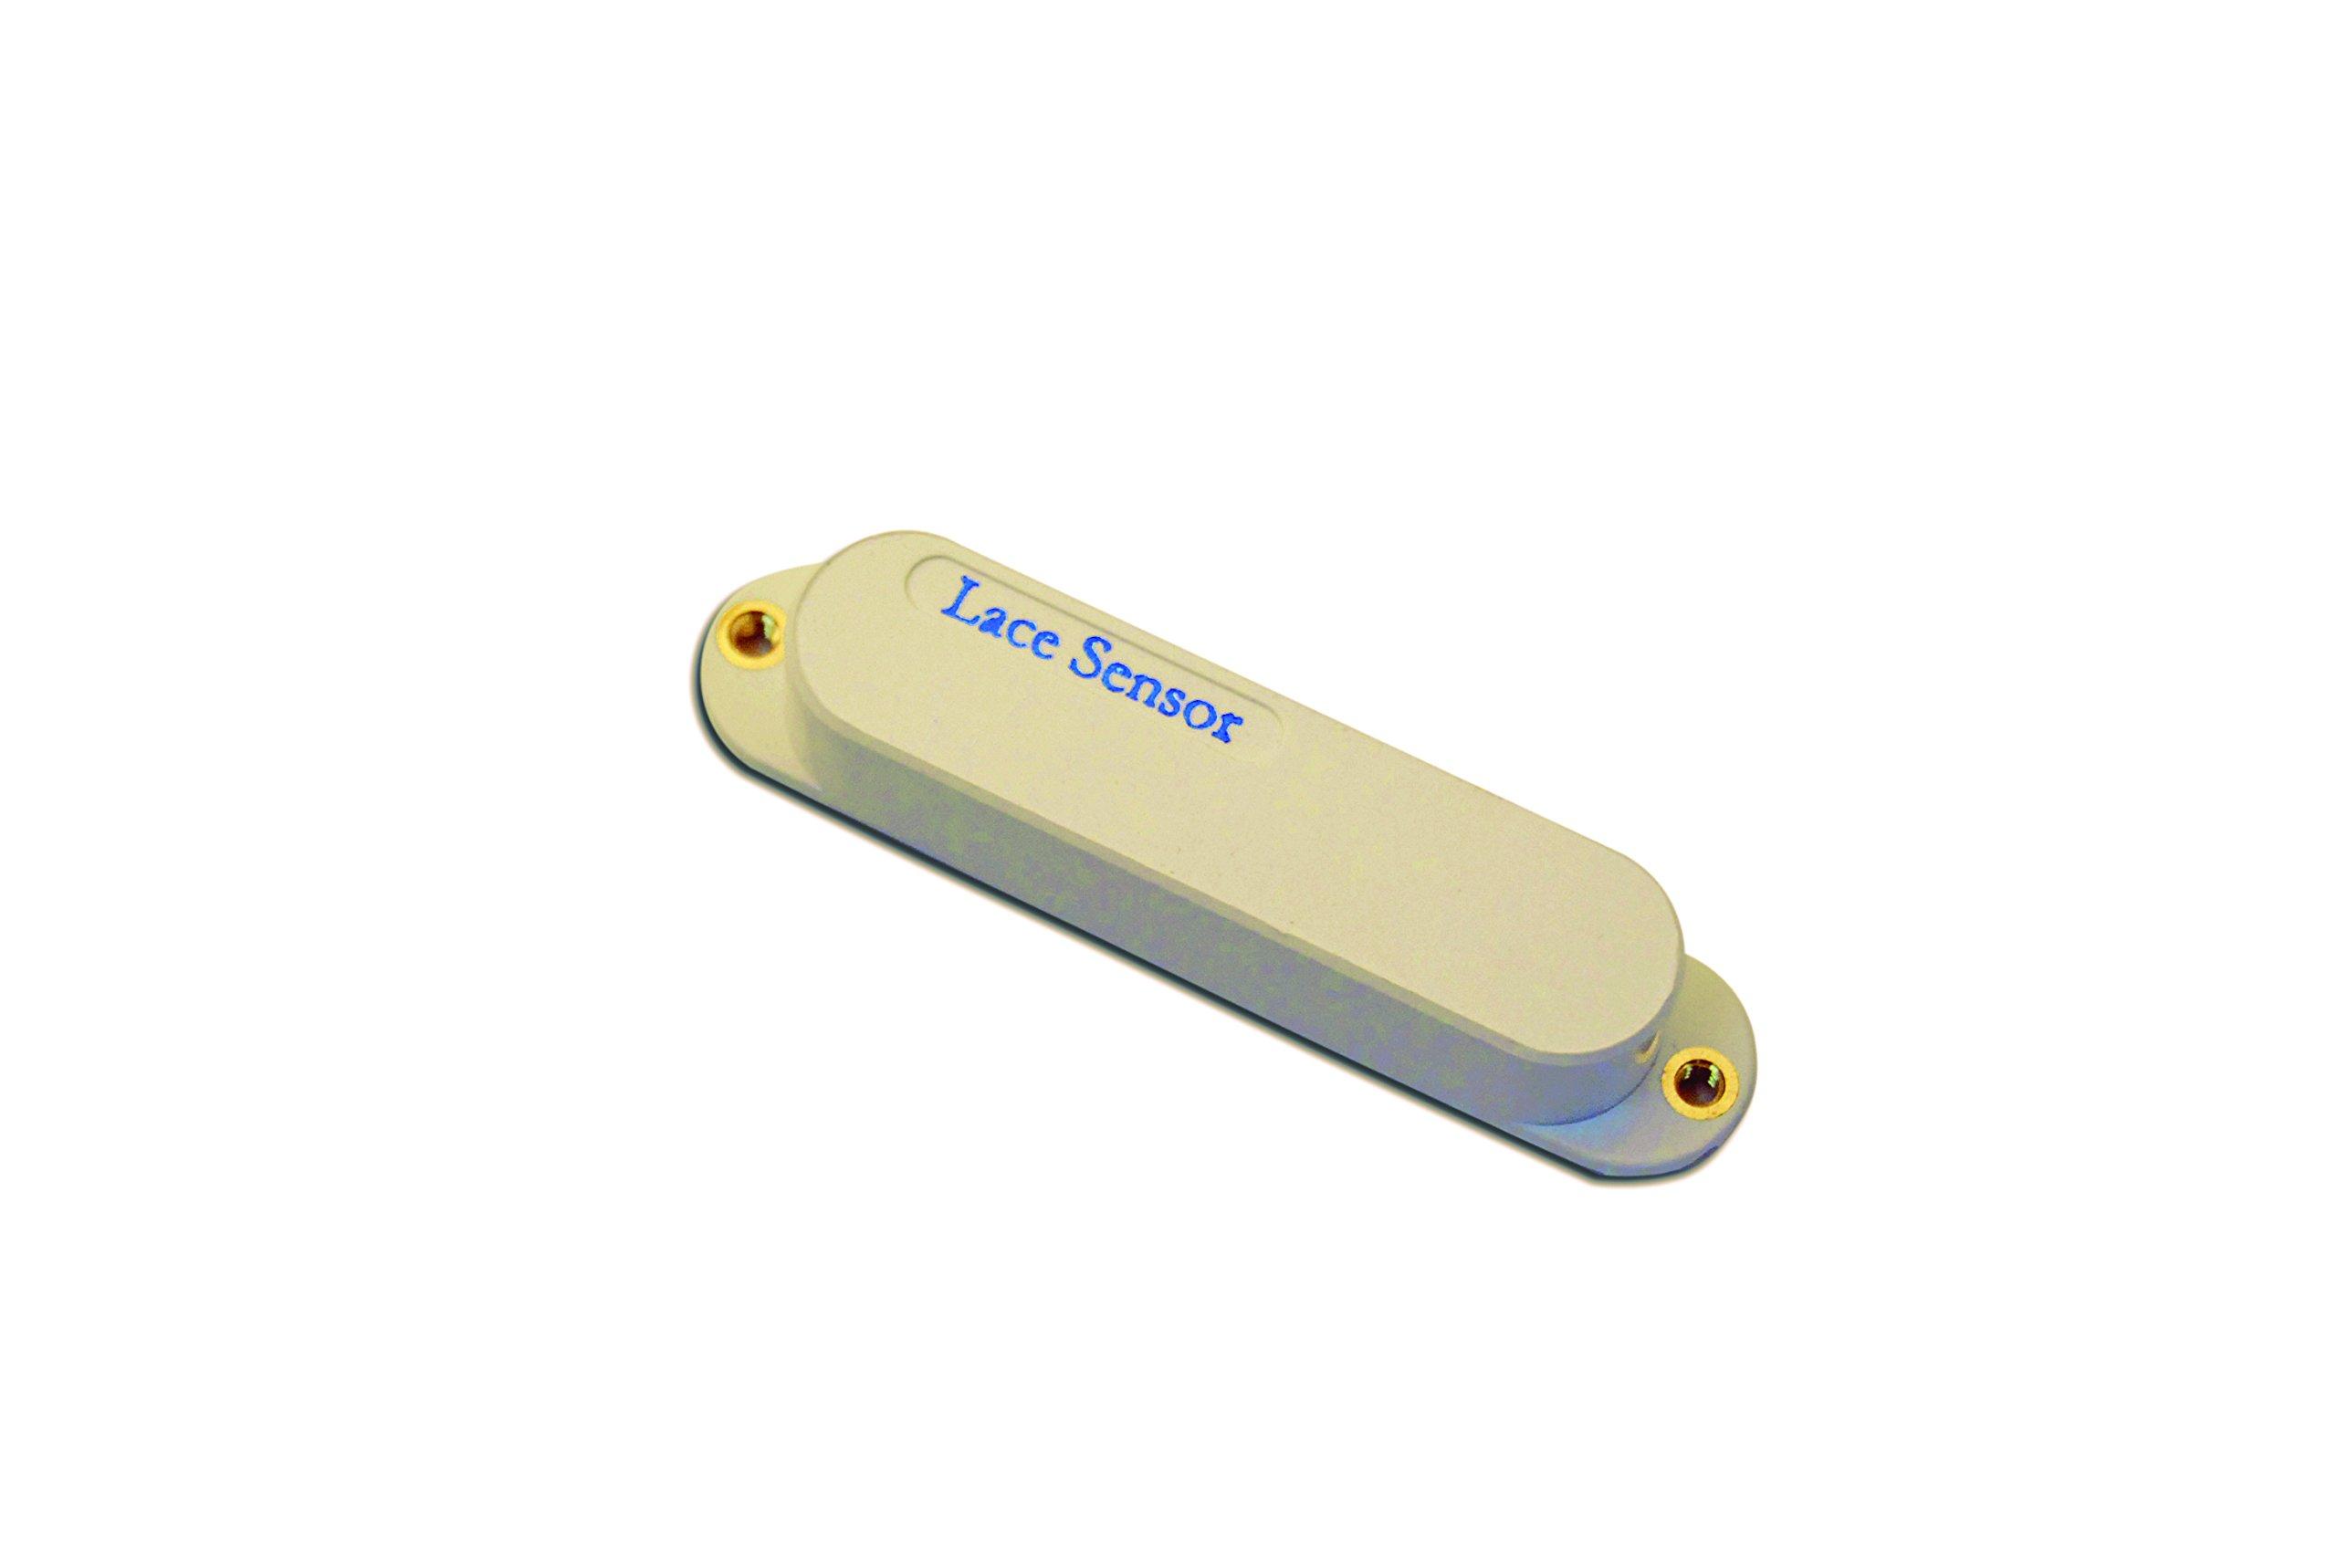 Lace Sensor 44461-03 Blue Cream Cover Electric Guitar Electronics